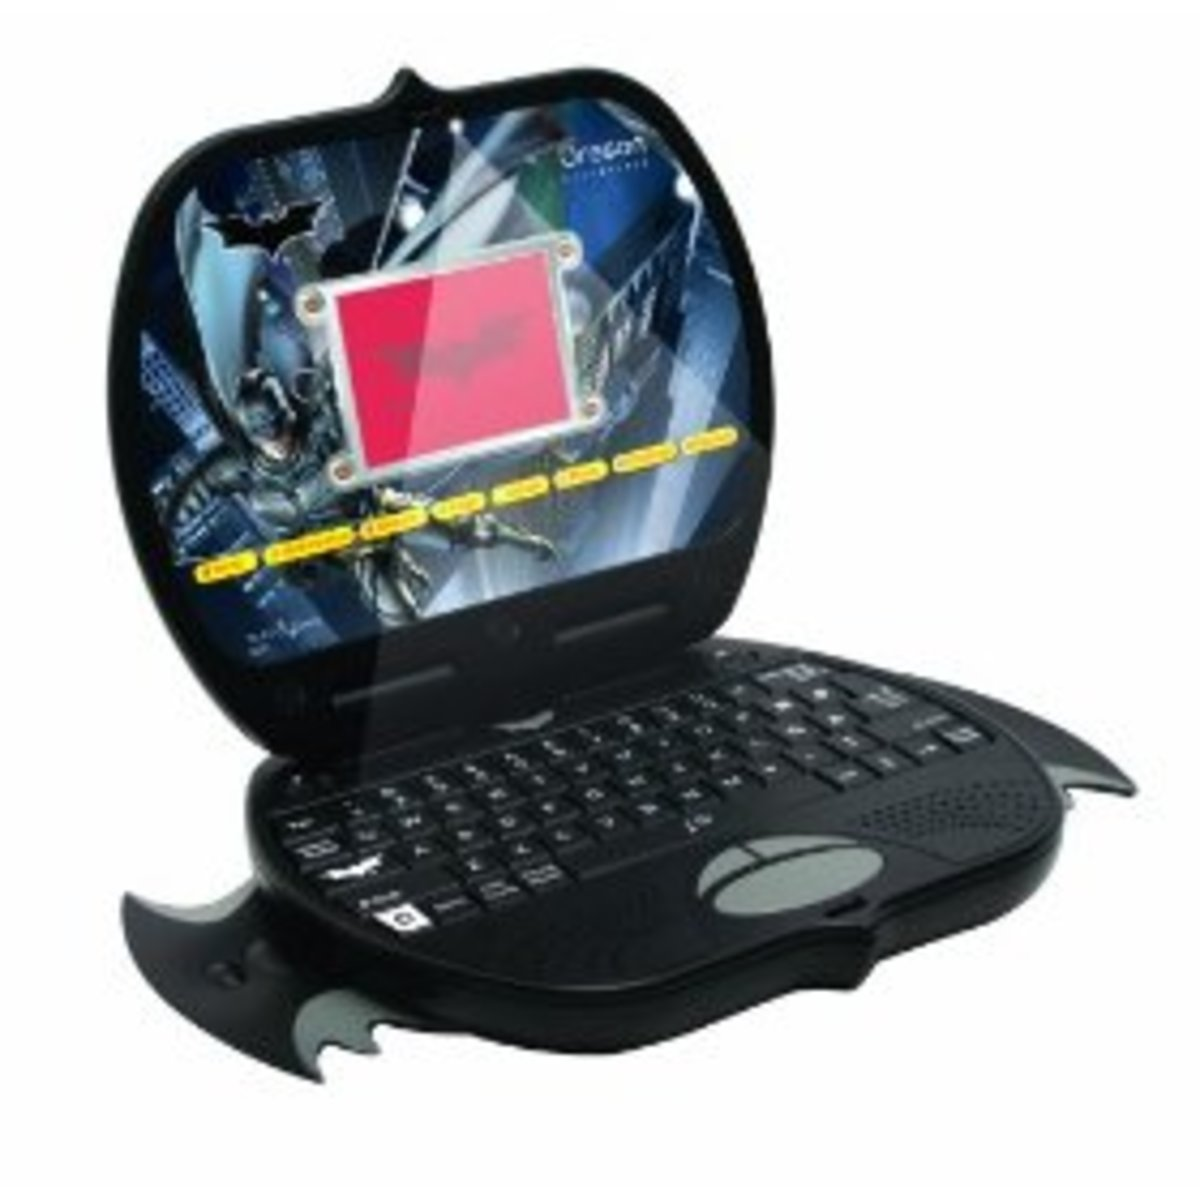 Oregon Scientific Batman PowerWing Laptop